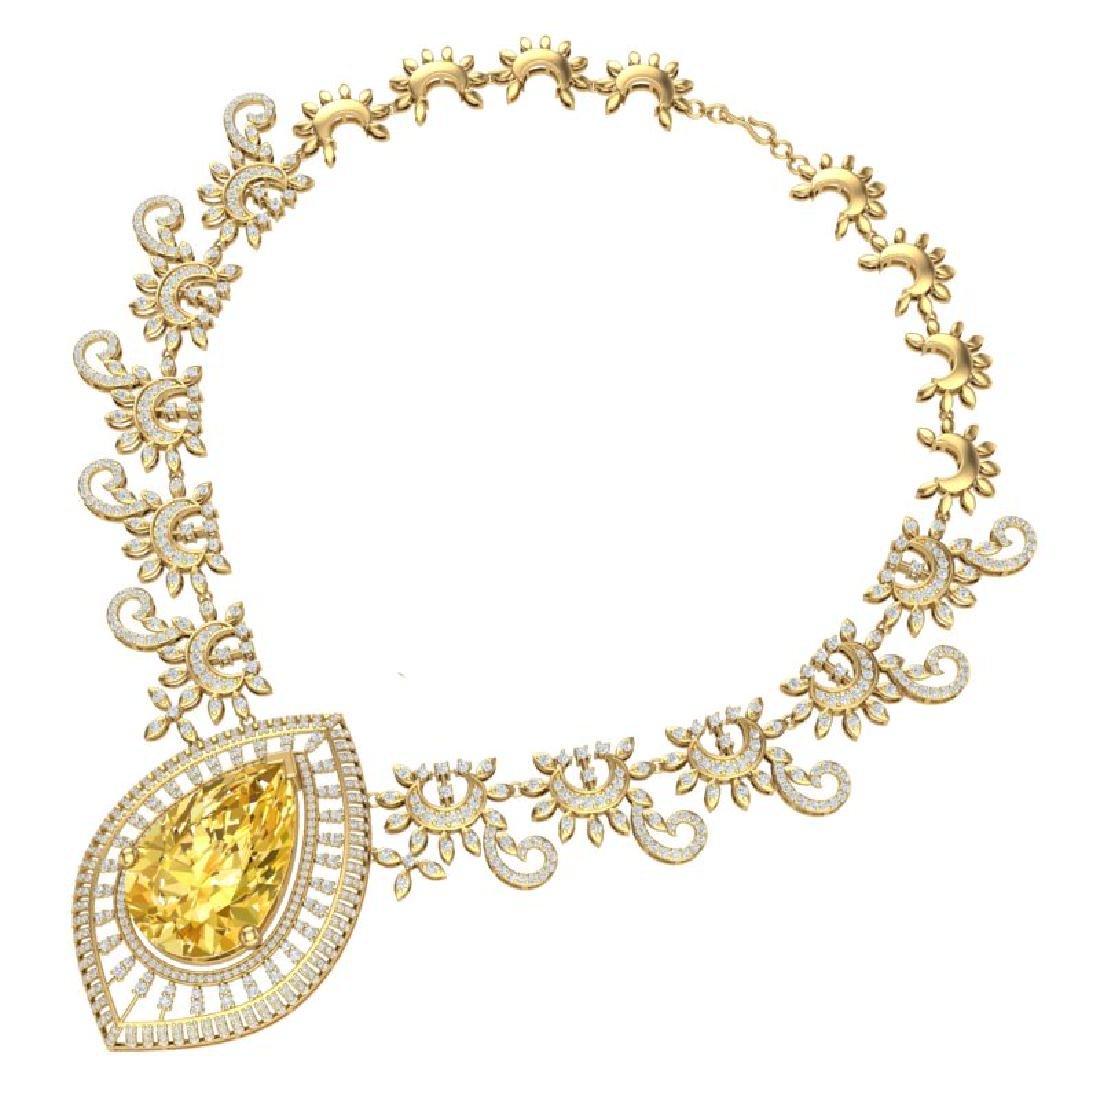 53.17 CTW Royalty Canary Citrine & VS Diamond Necklace - 3